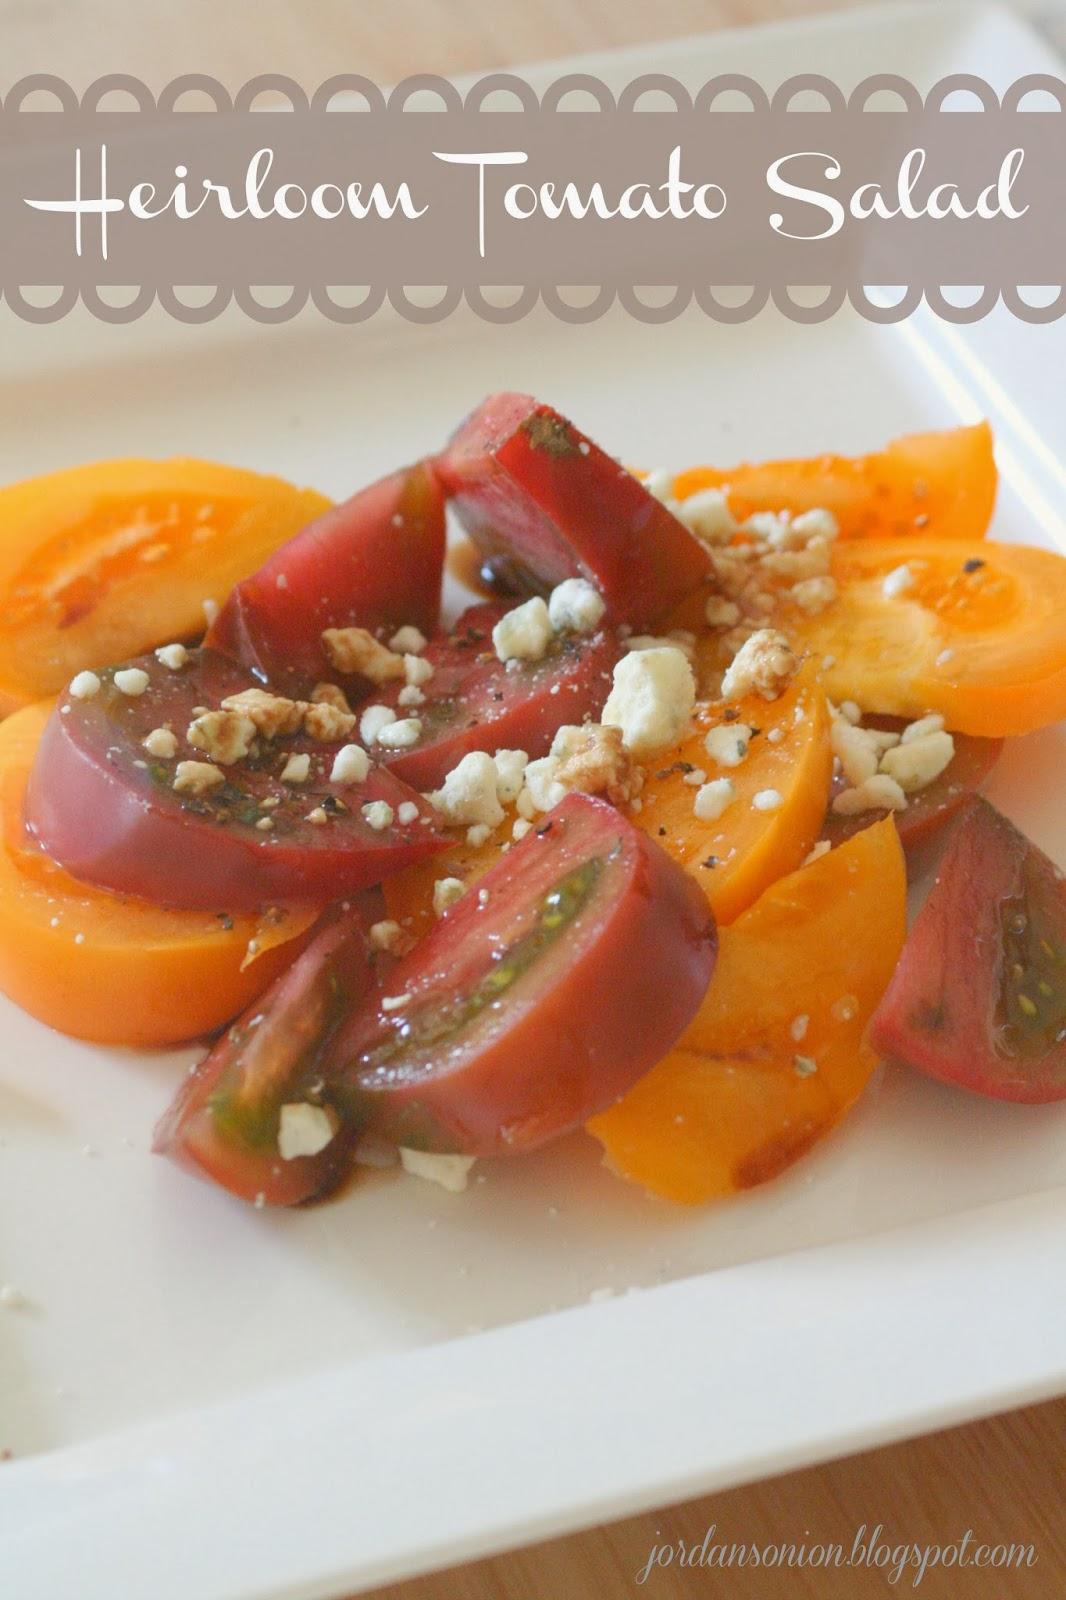 Jordan's Onion: Heirloom Tomato Salad